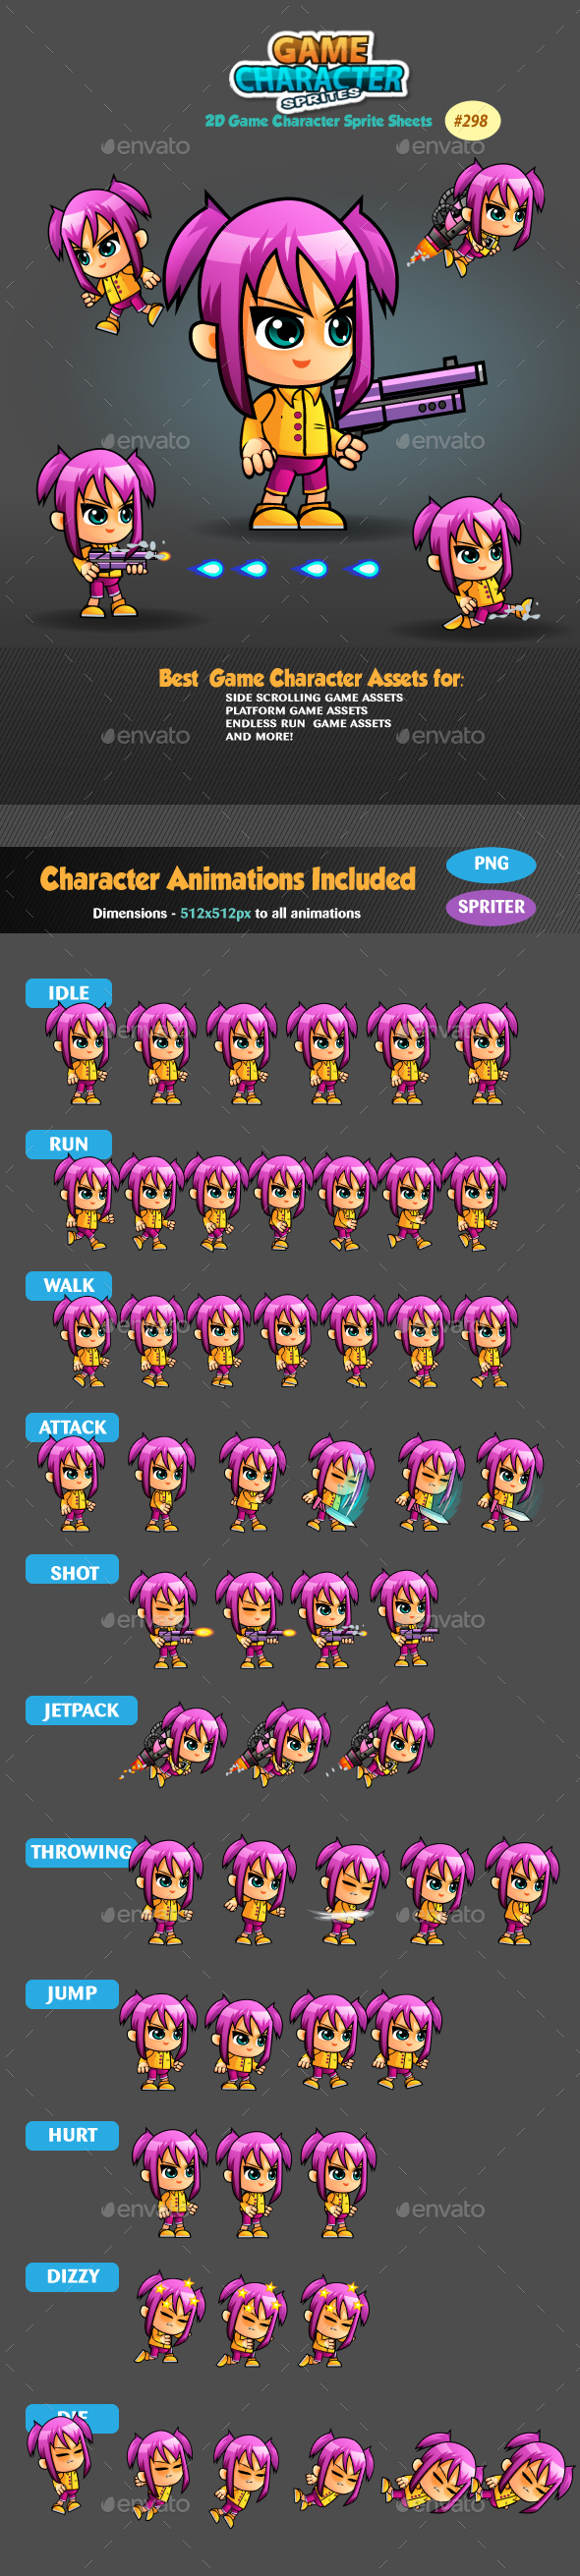 2D Game Character Sprites 298 - Sprites Game Assets